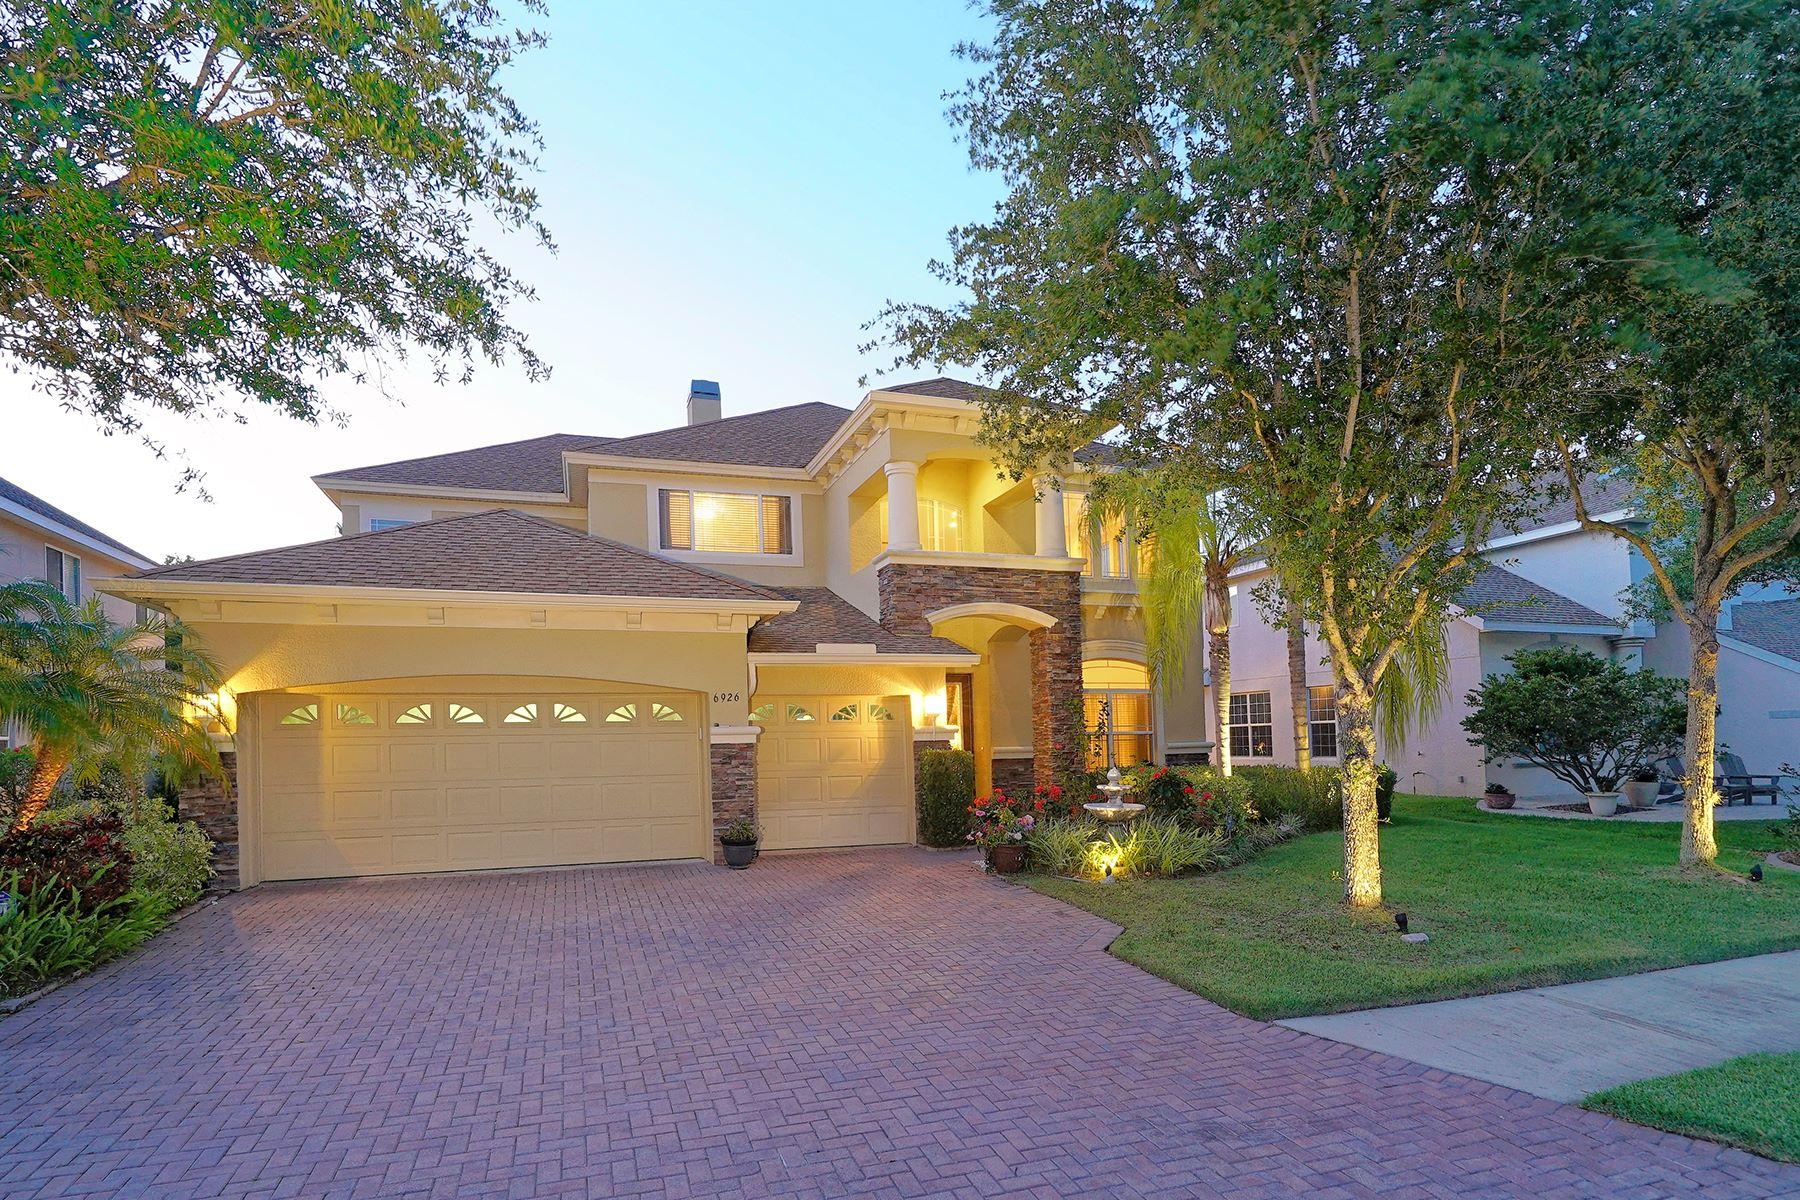 Single Family Home for Sale at OAKLEAF HAMMOCK 6926 40th Ct E Ellenton, Florida, 34222 United States